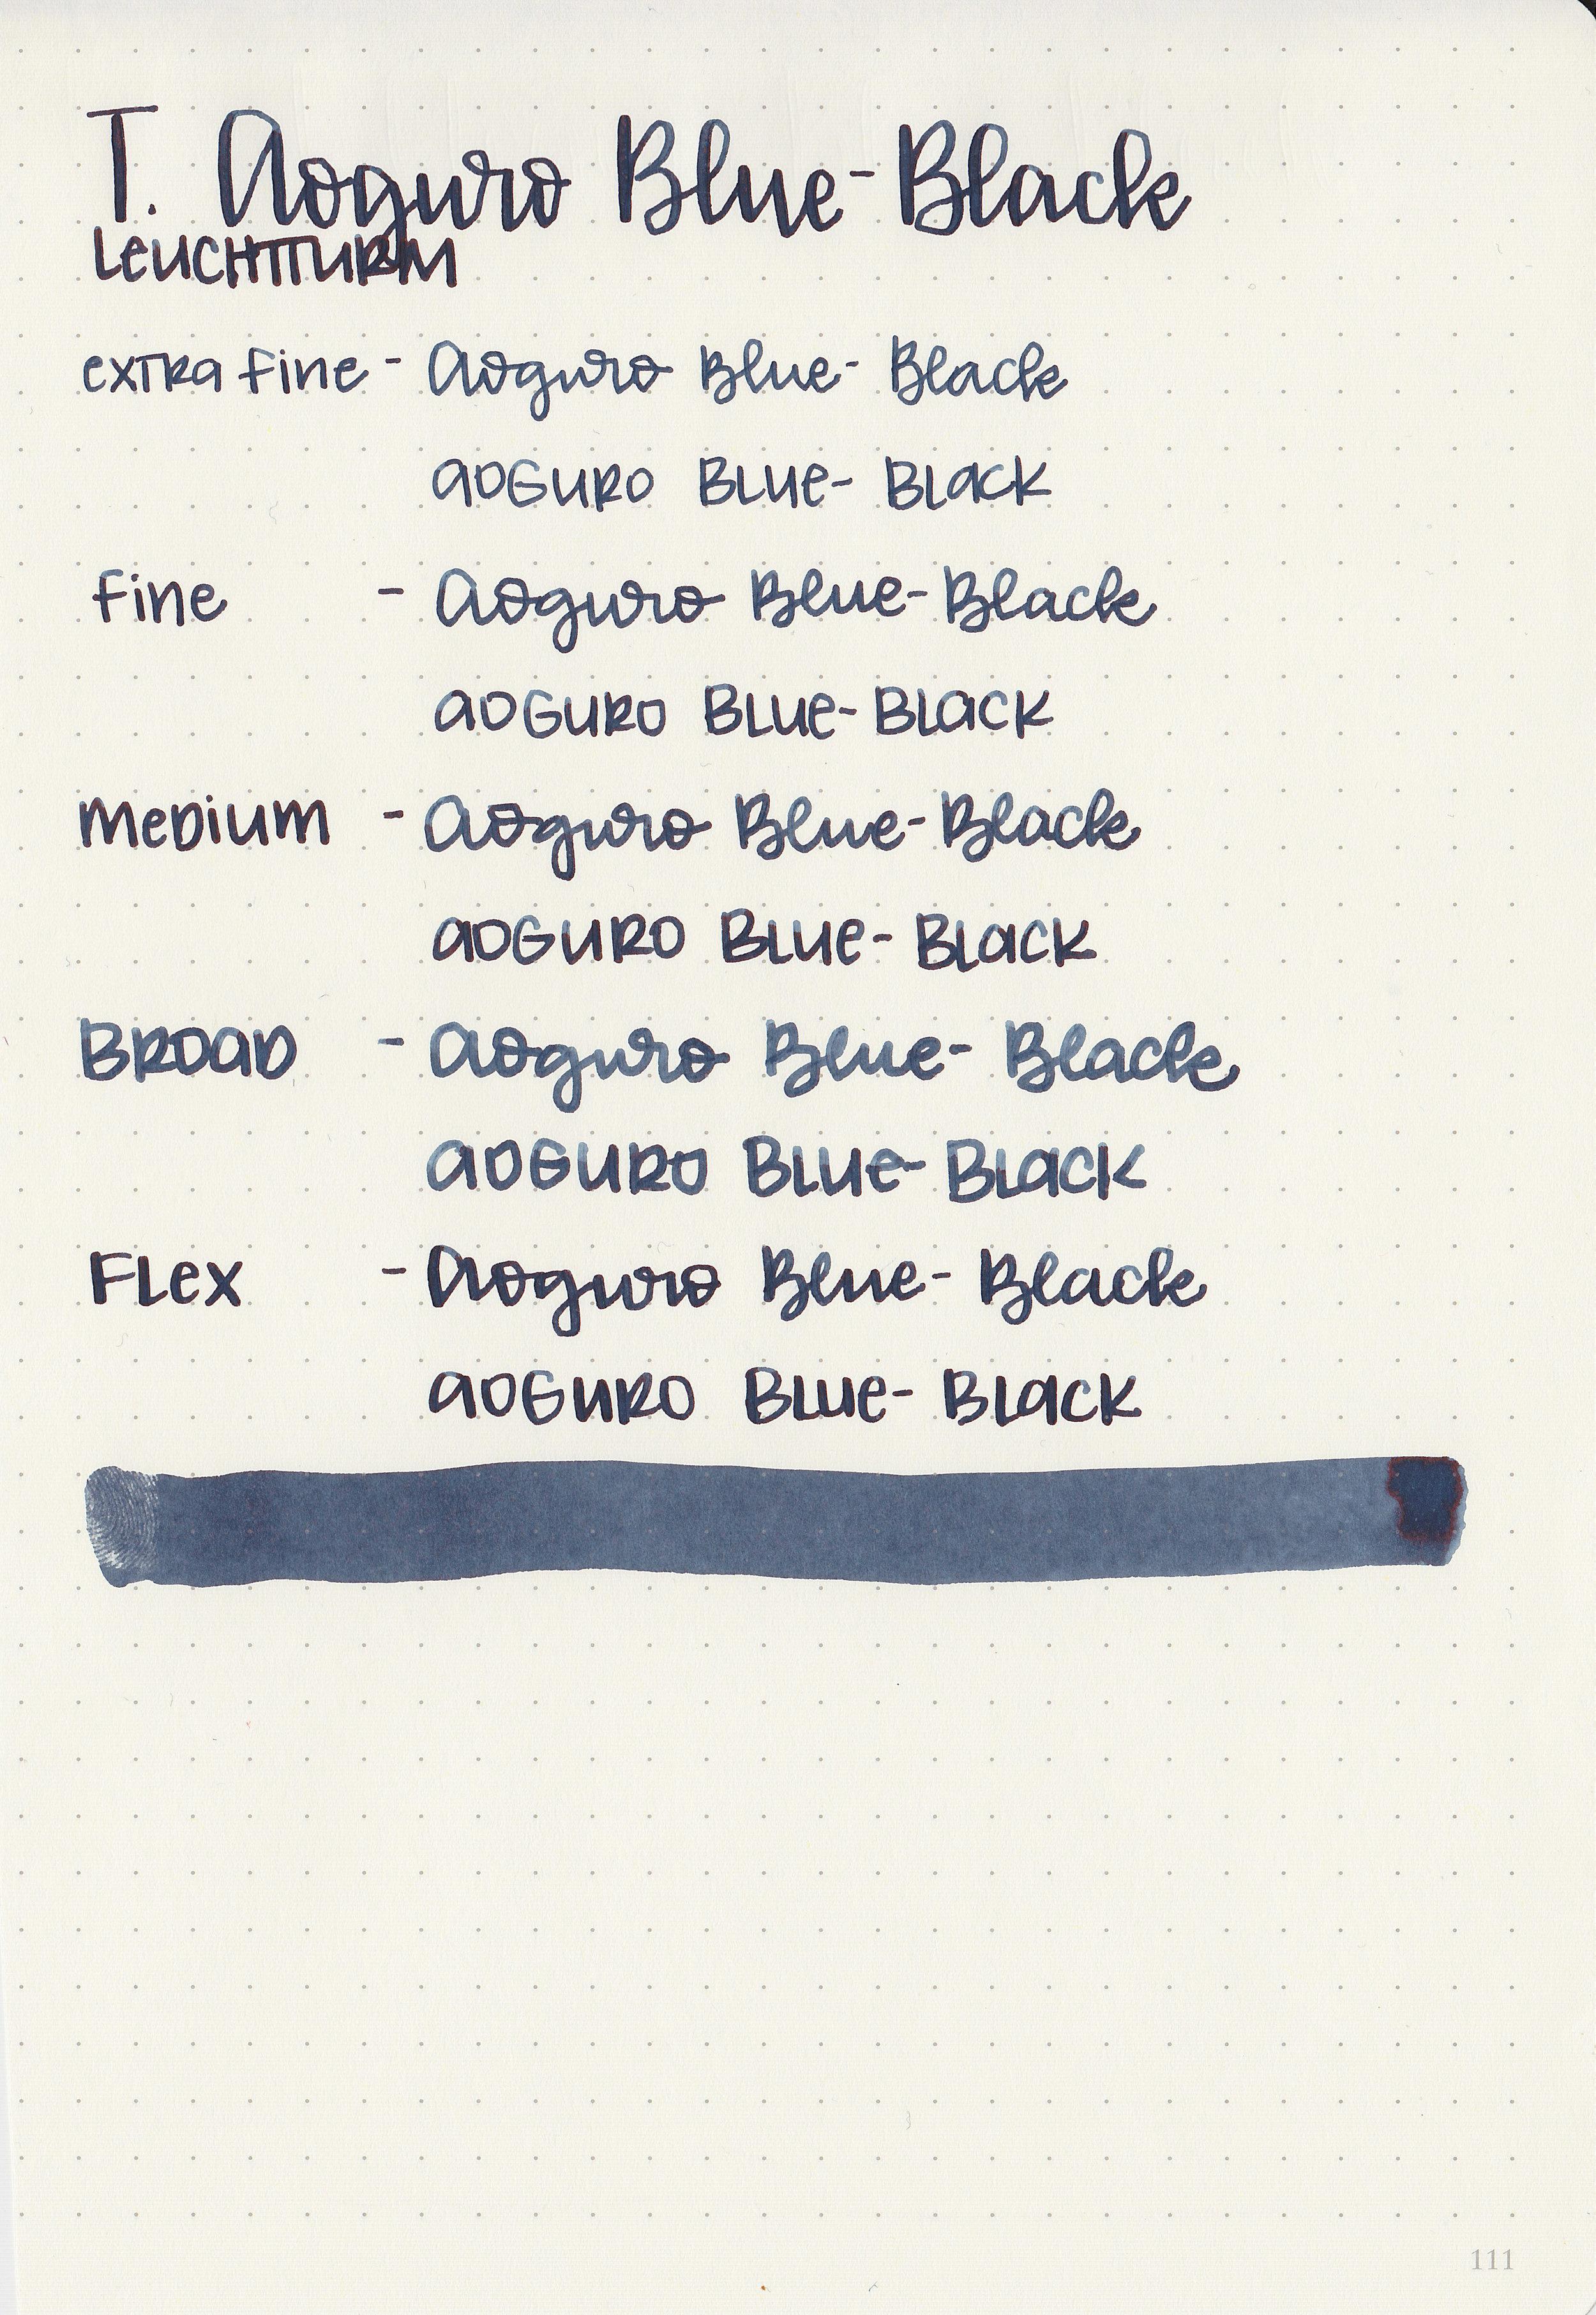 tac-aoguro-blue-black-11.jpg